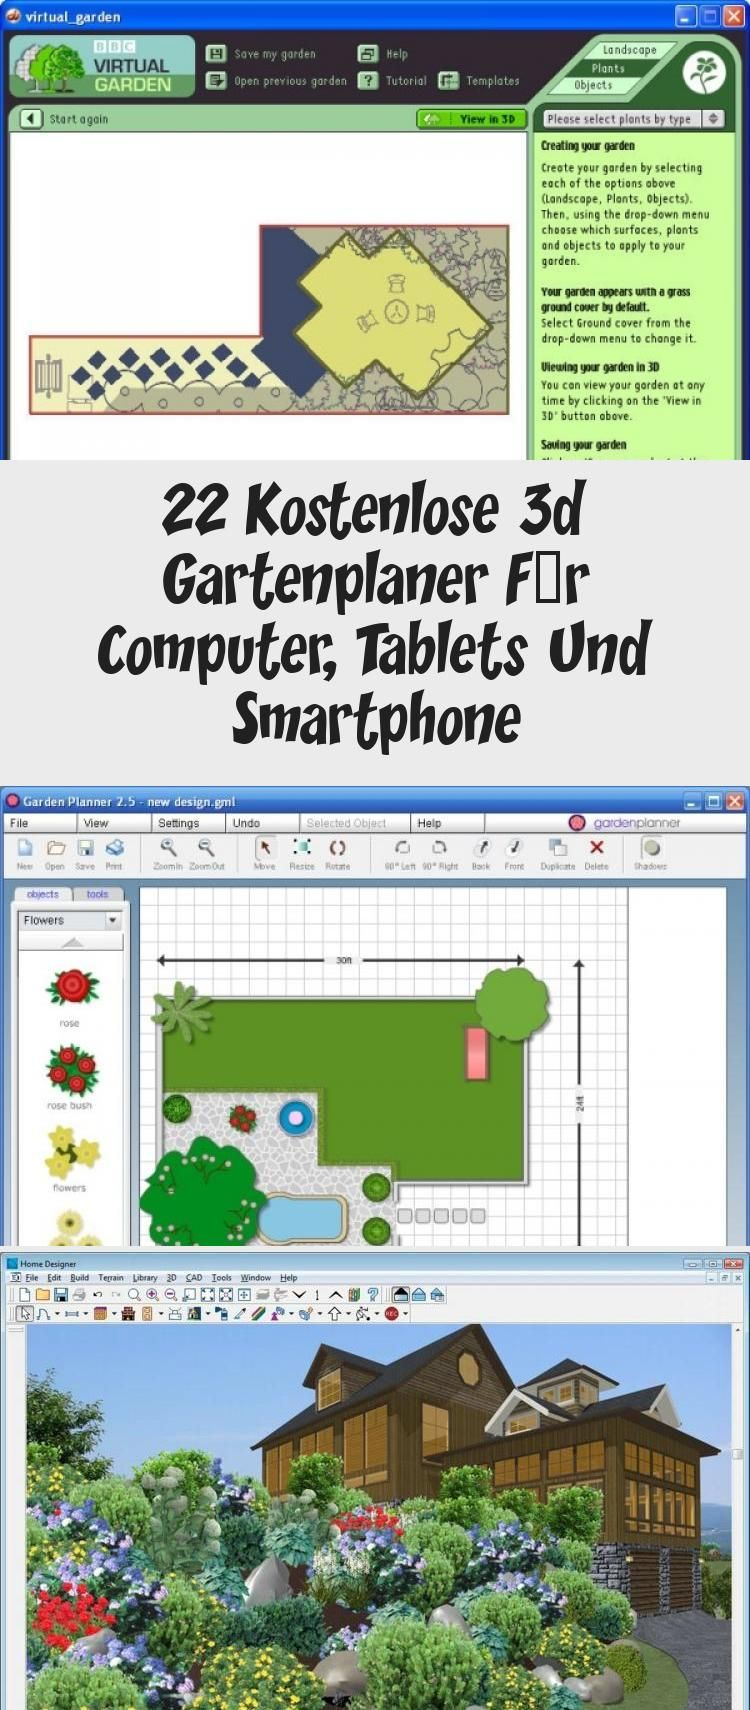 Planer Landschaftsbau Online Software Mein Schoener Garten Planungstool Gartenplanungkinder Gartenplanungideen Gartenplanungmitpoo In 2020 Plants Templates Tutorial